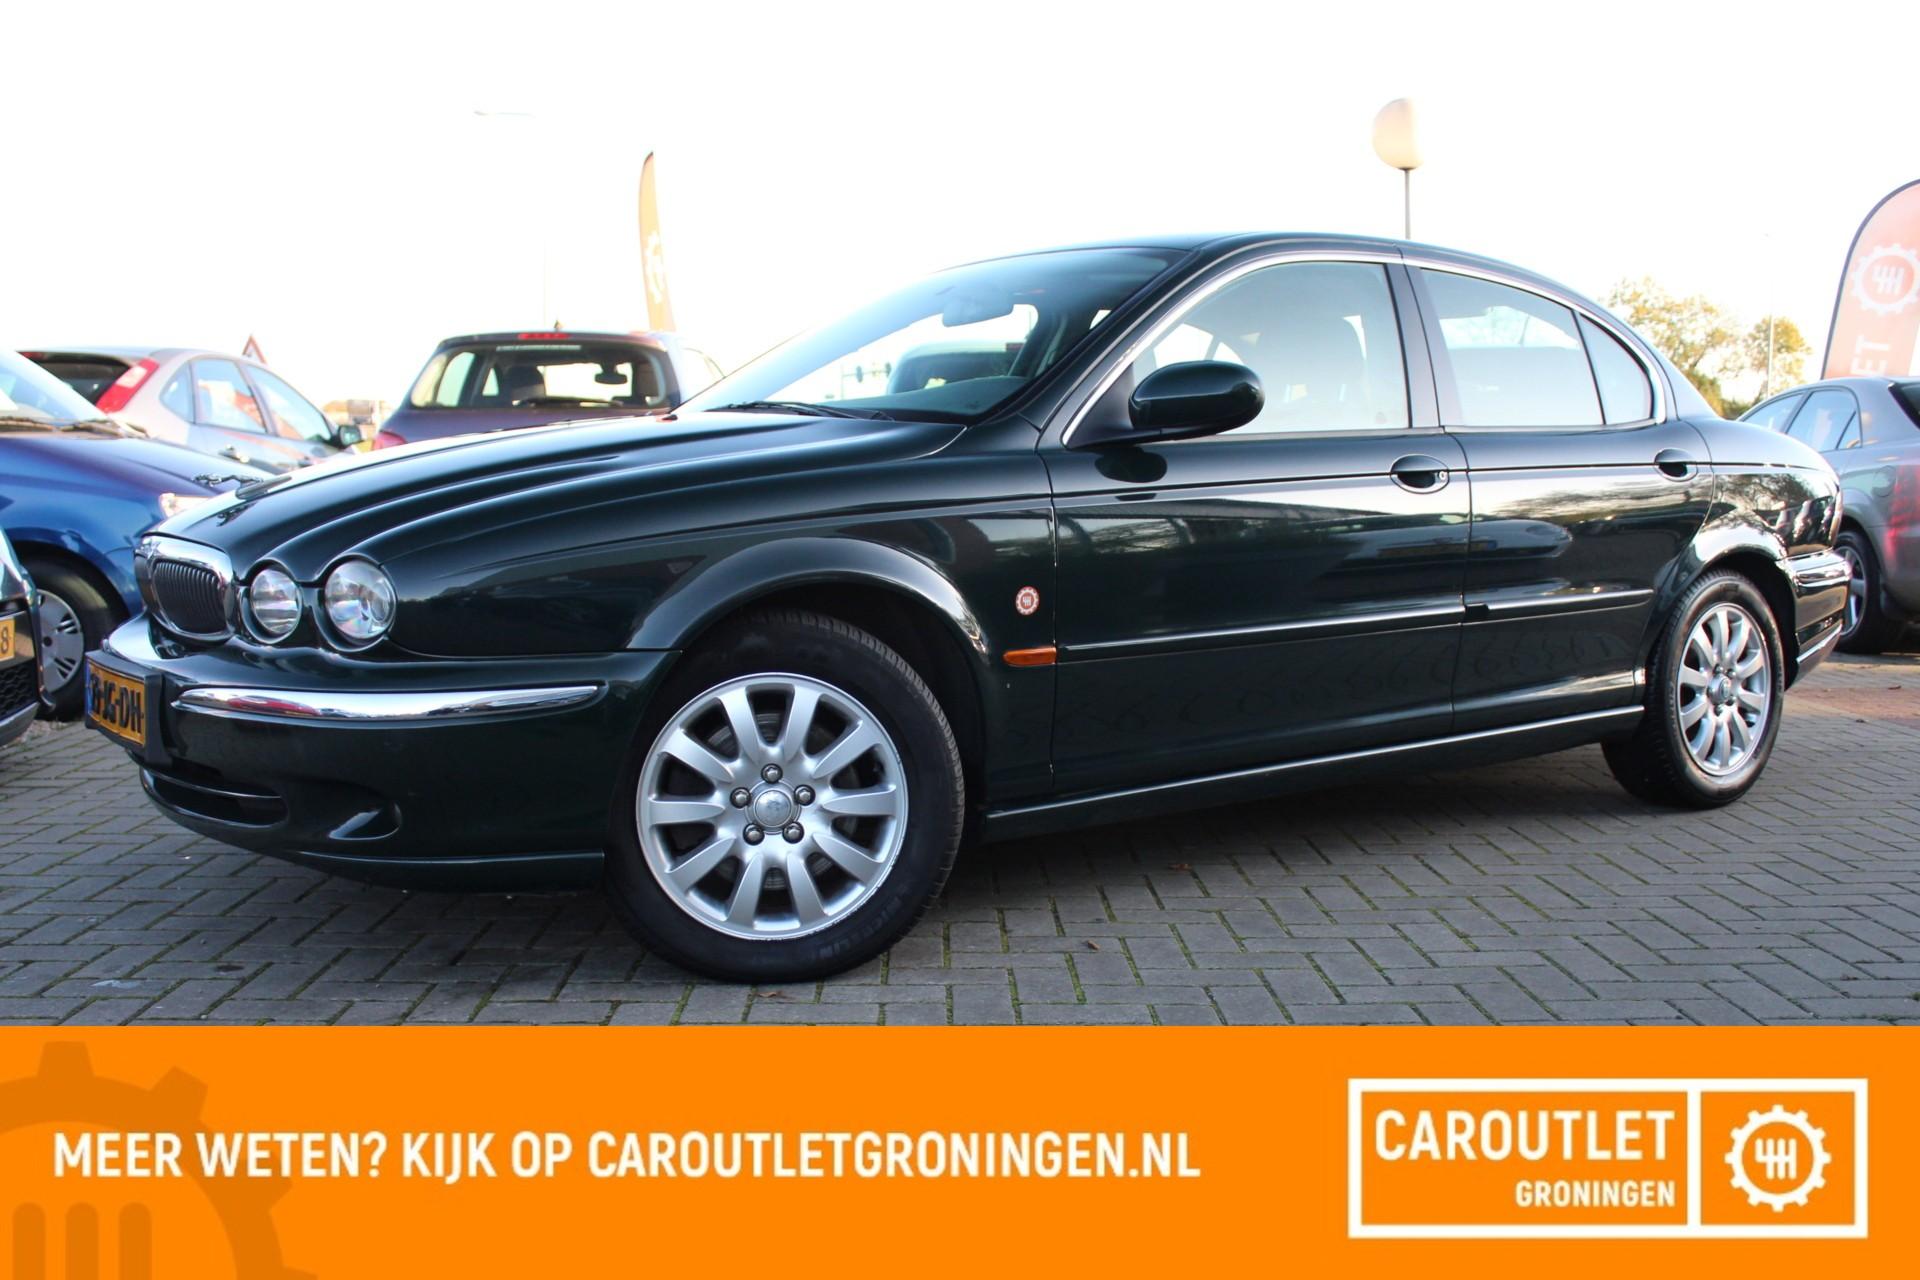 Caroutlet Groningen - Jaguar X-type 2.5 V6 Executive   AWD   NAVI   CLIMA